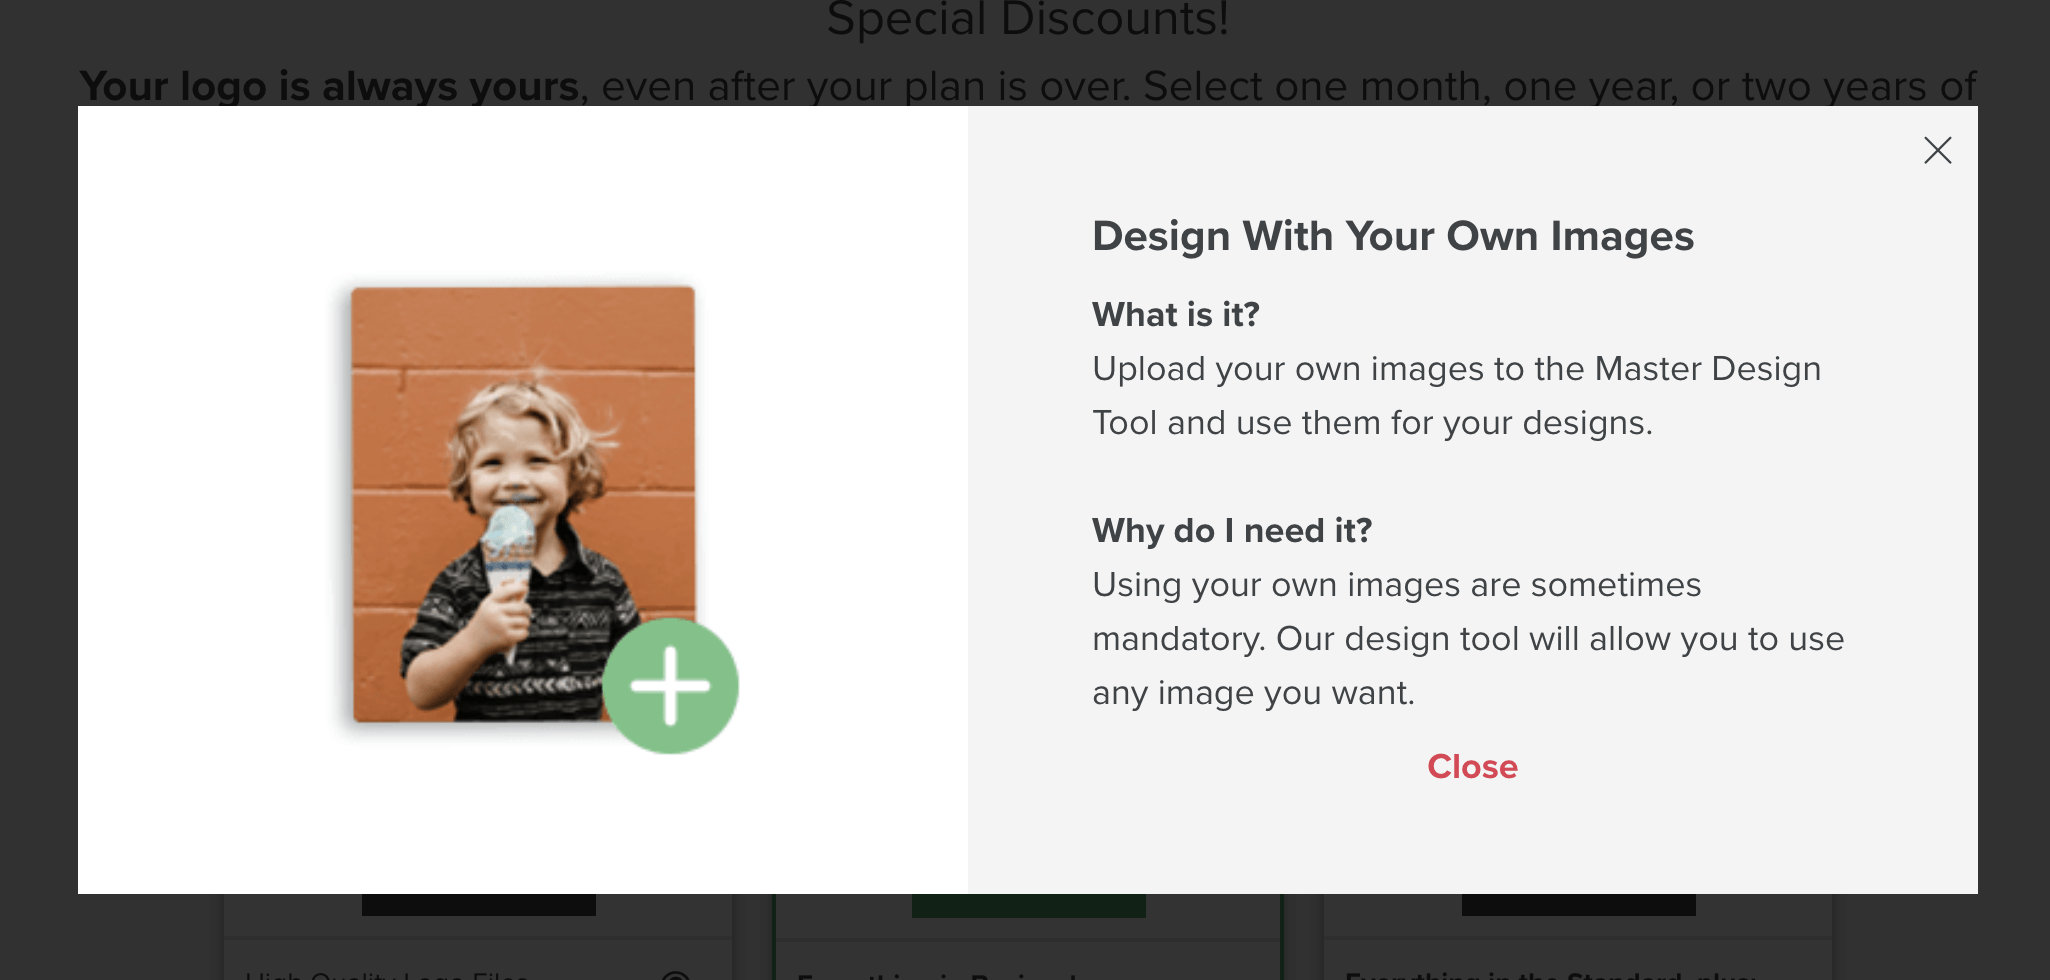 Tailor Brands screenshot - Uploading your own images